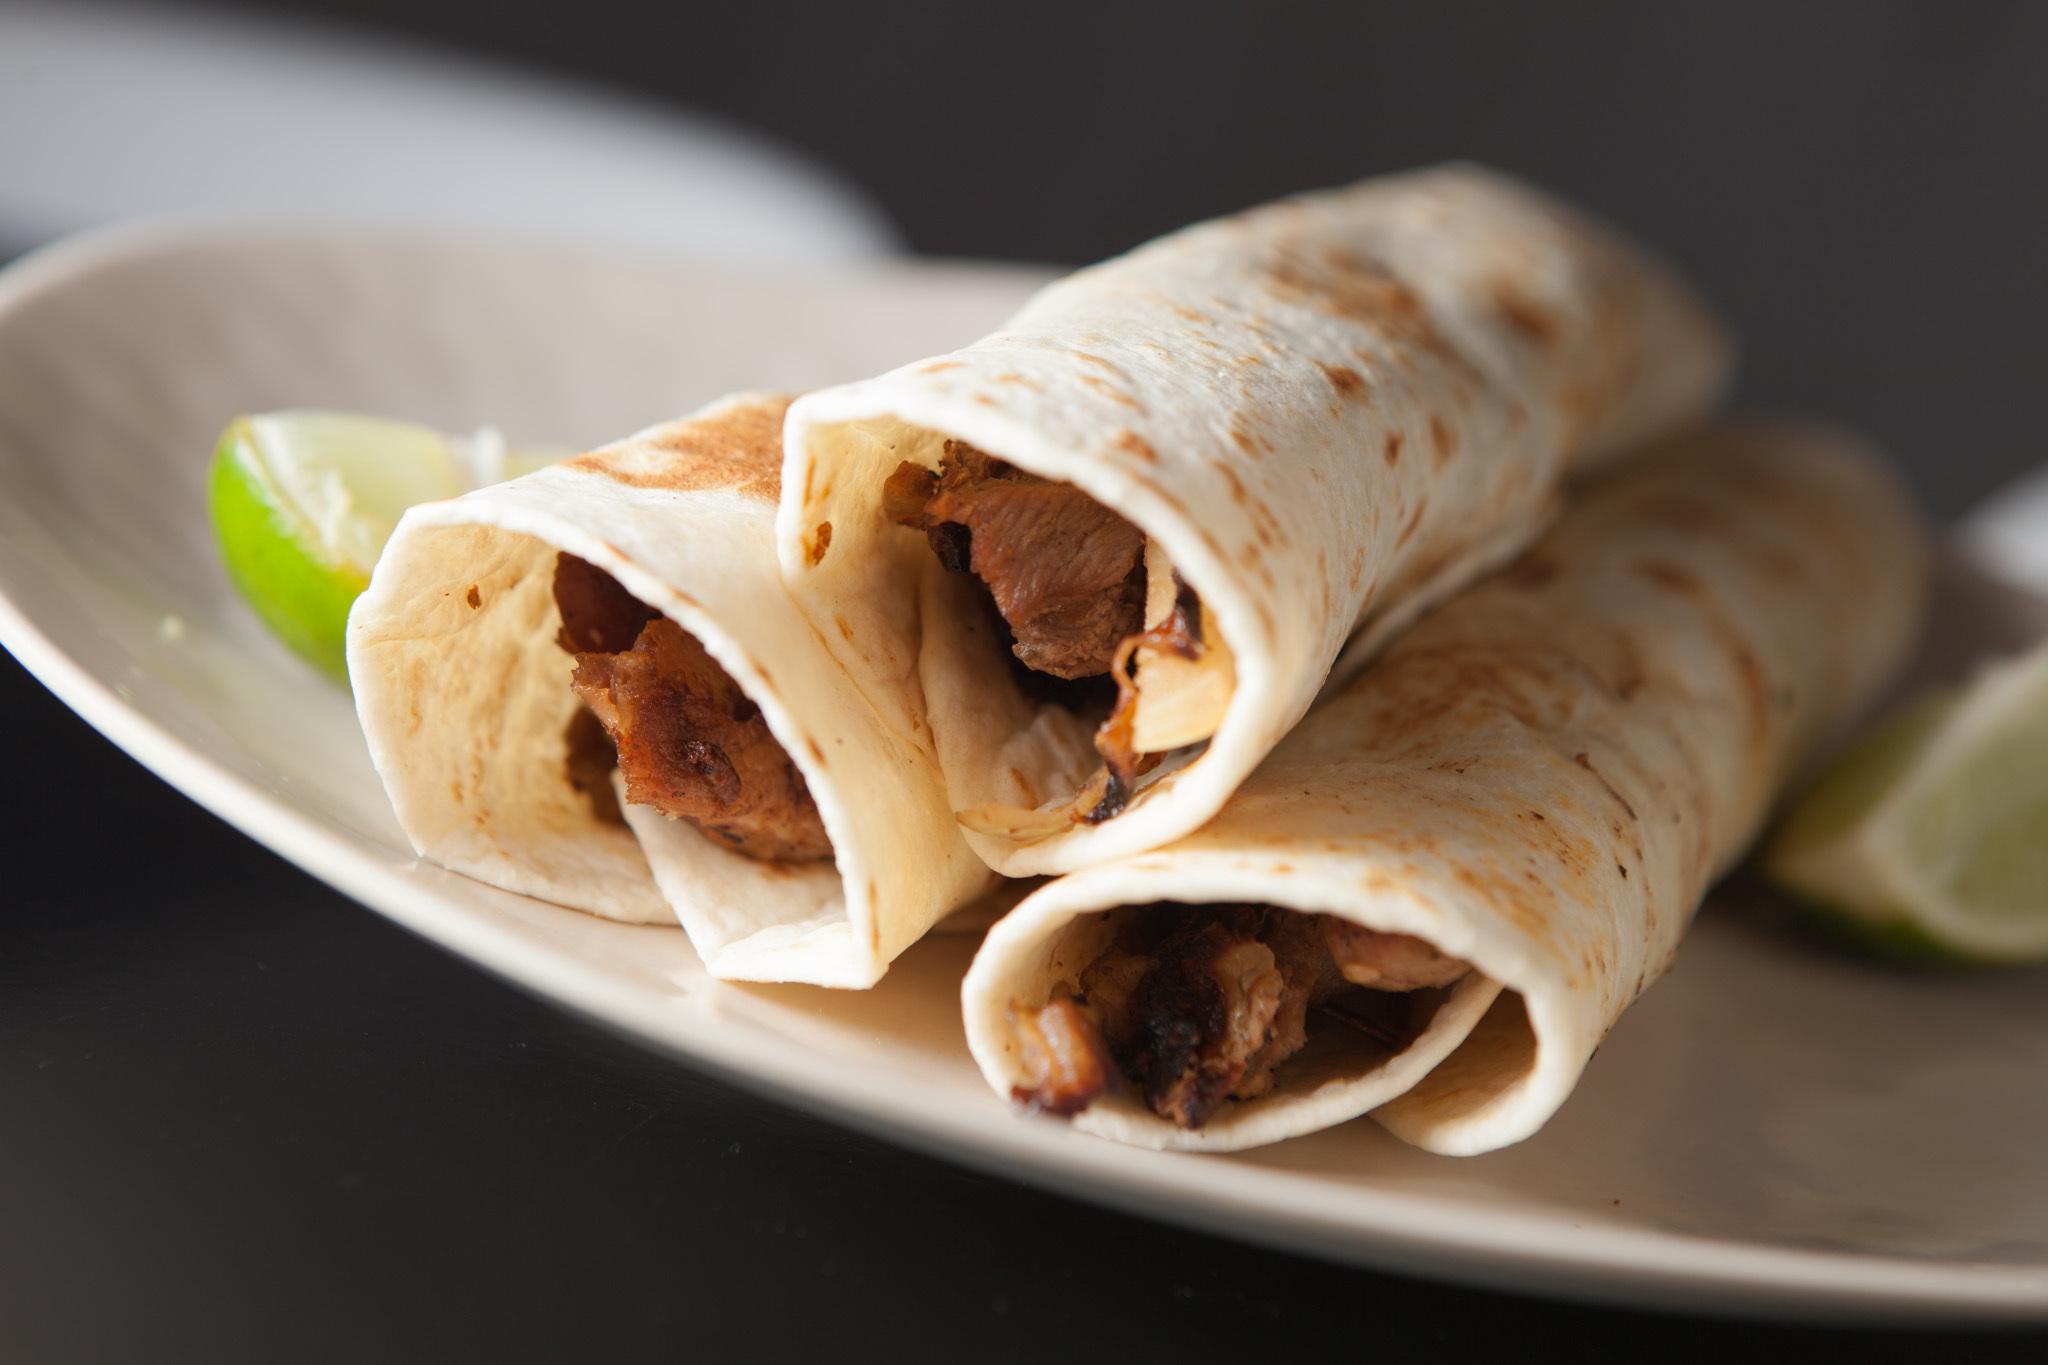 Taco arabe at Cemitas Puebla